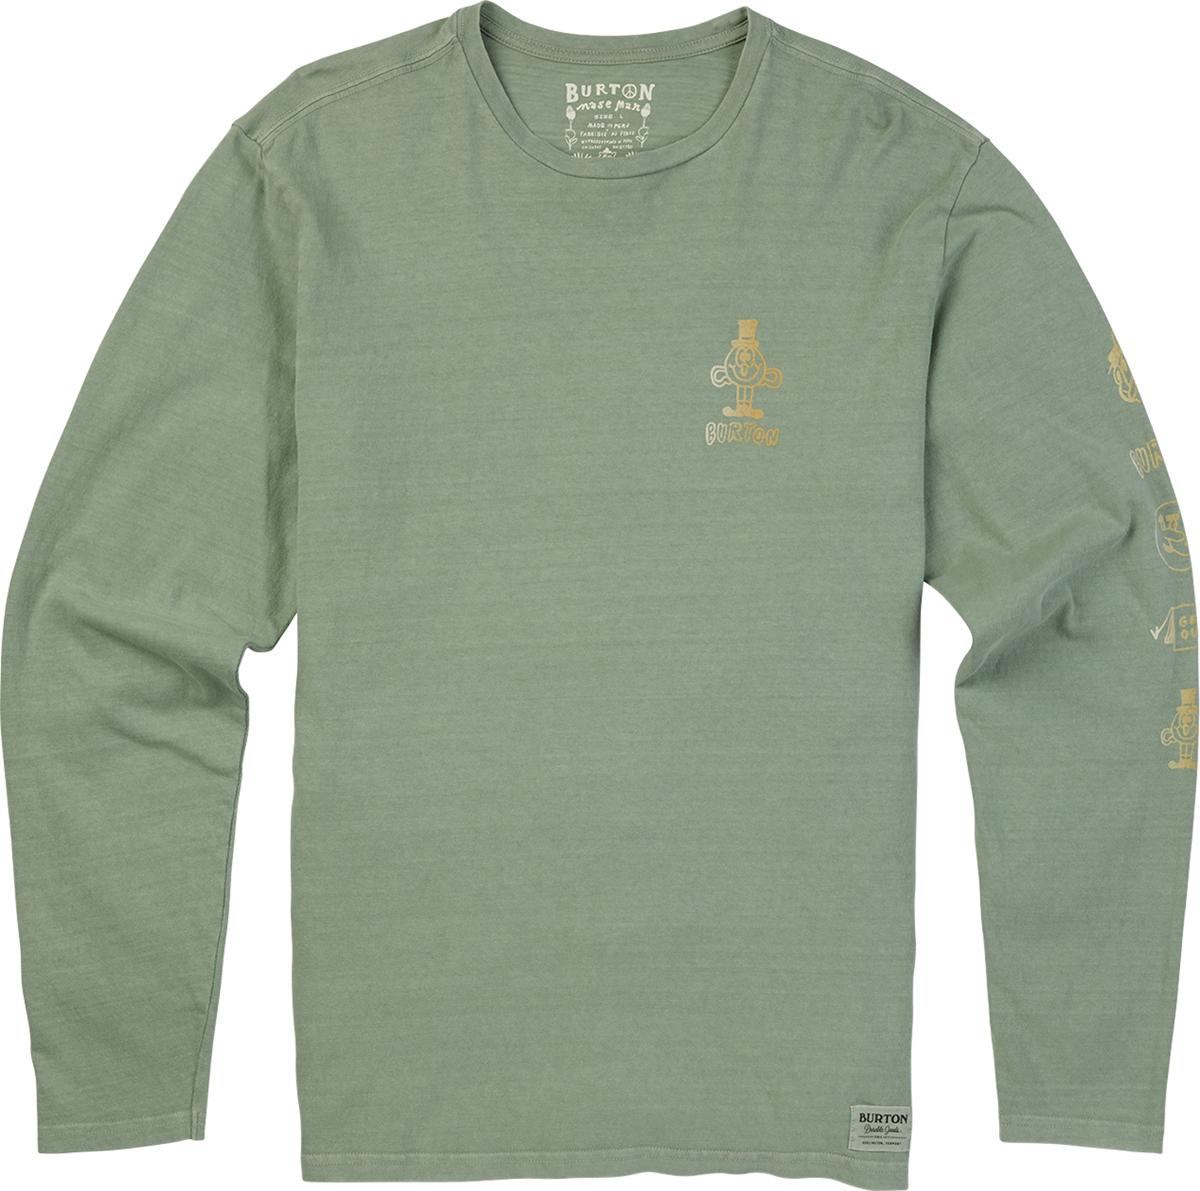 Футболка мужская Burton Mb Still Trippn Ls, цвет: оливковый. 18965101300. Размер XXL (54) burton футболка